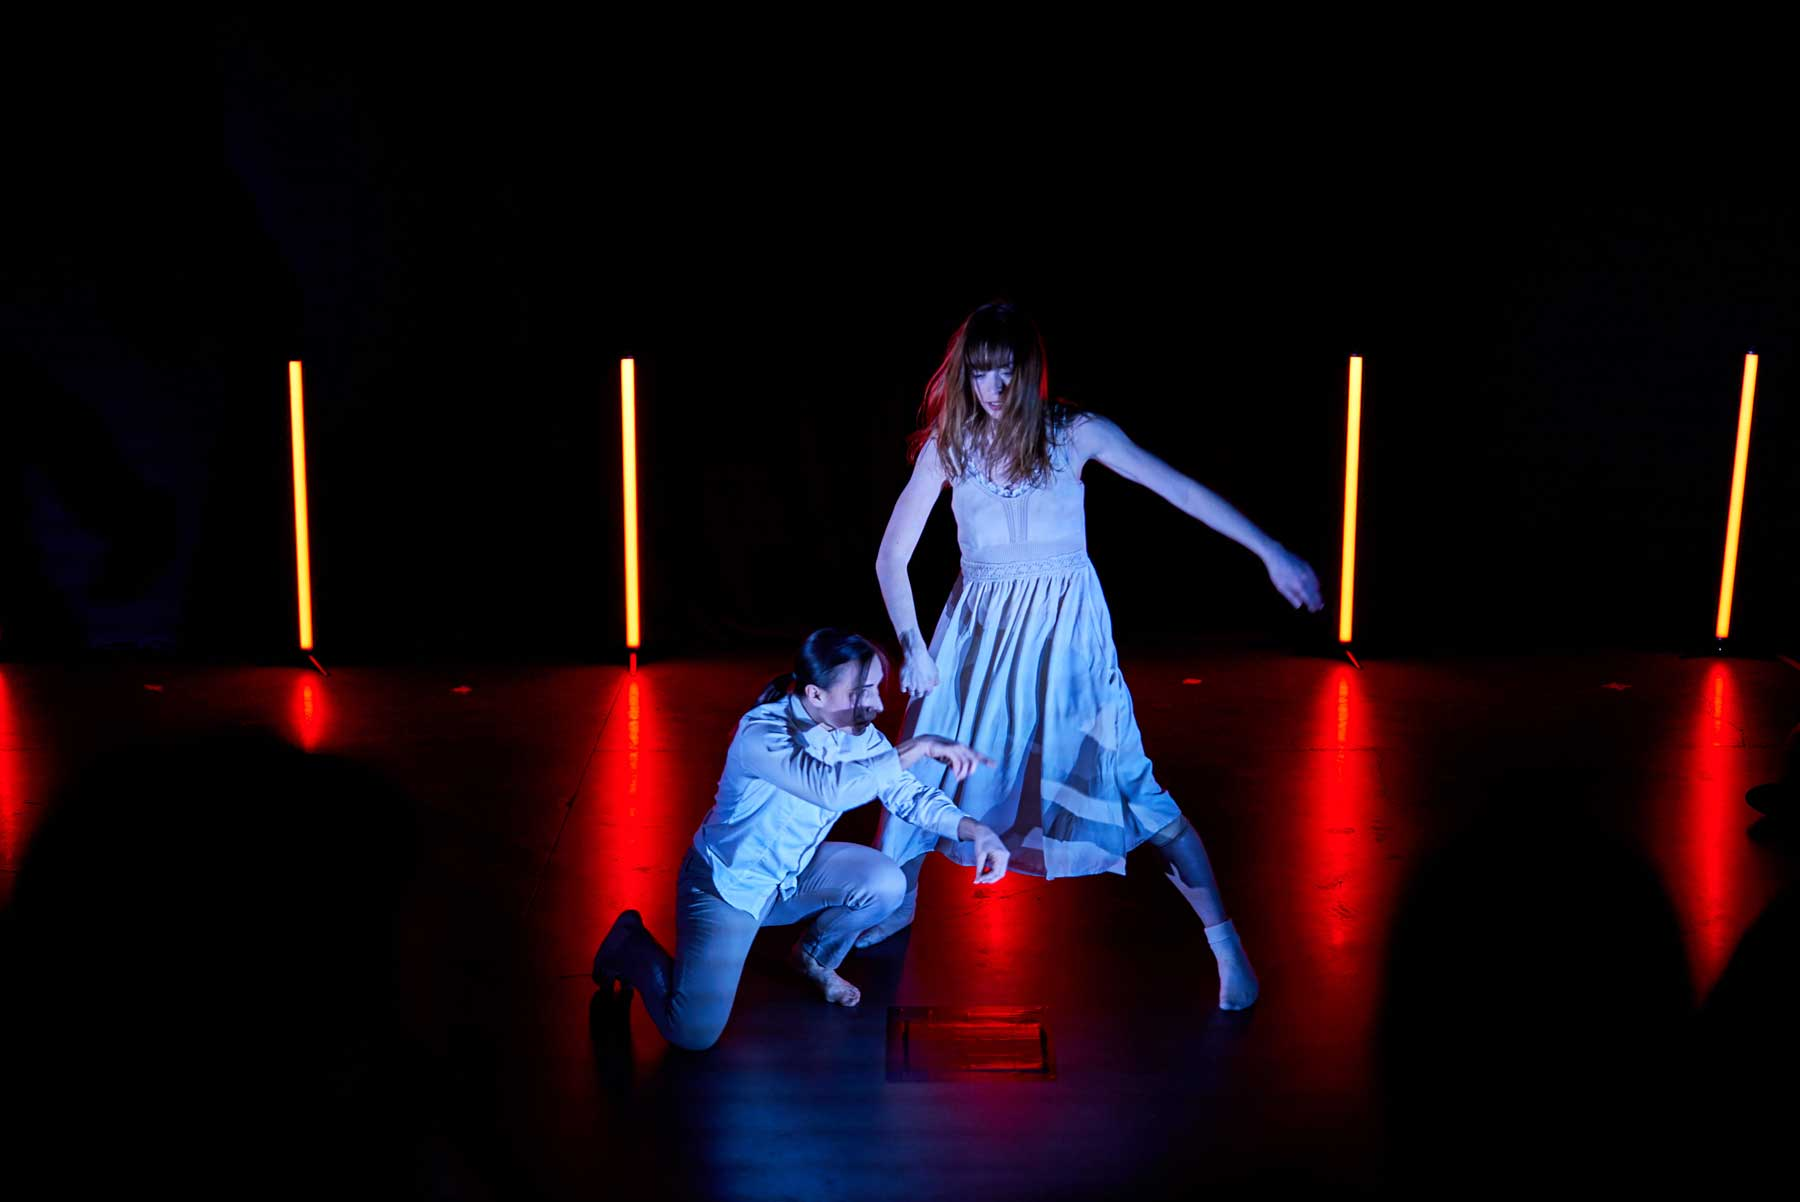 mardi-culturel-td-danse-danse-kyra-jean-green-trip-the-light-fantastic-12.jpg